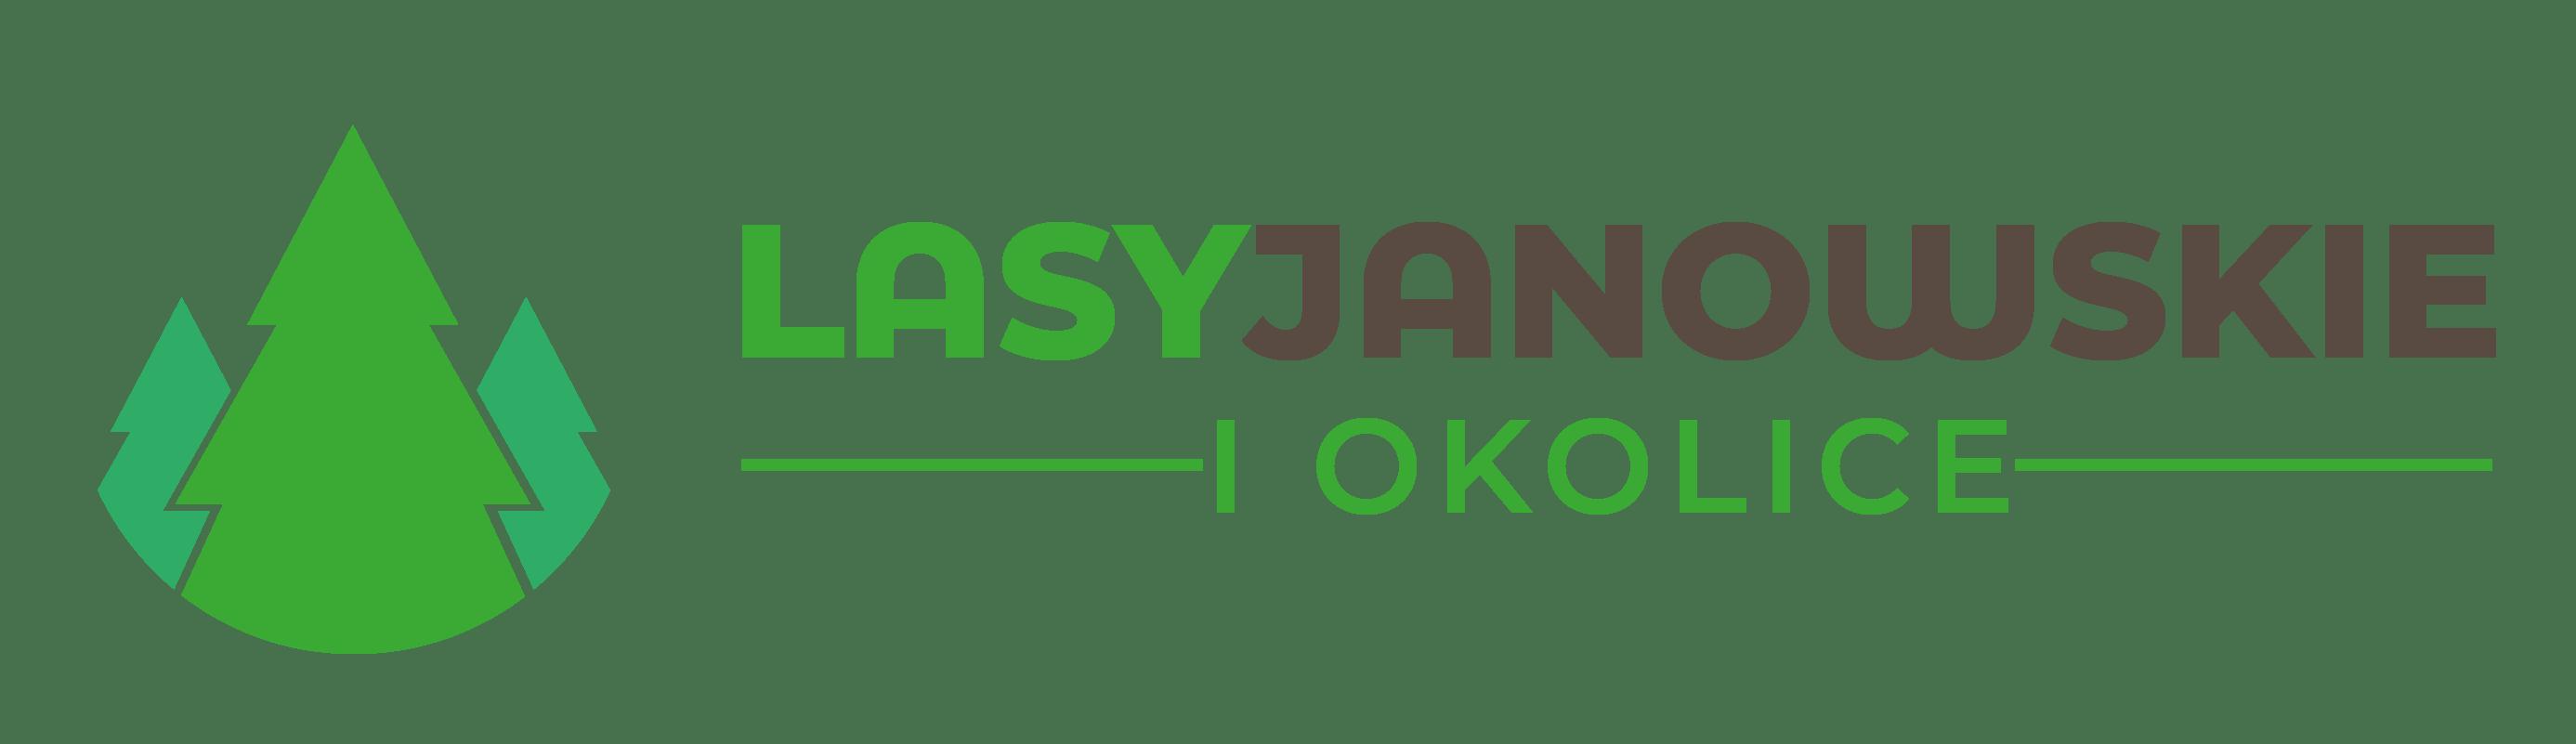 Lasy Janowskie i okolice